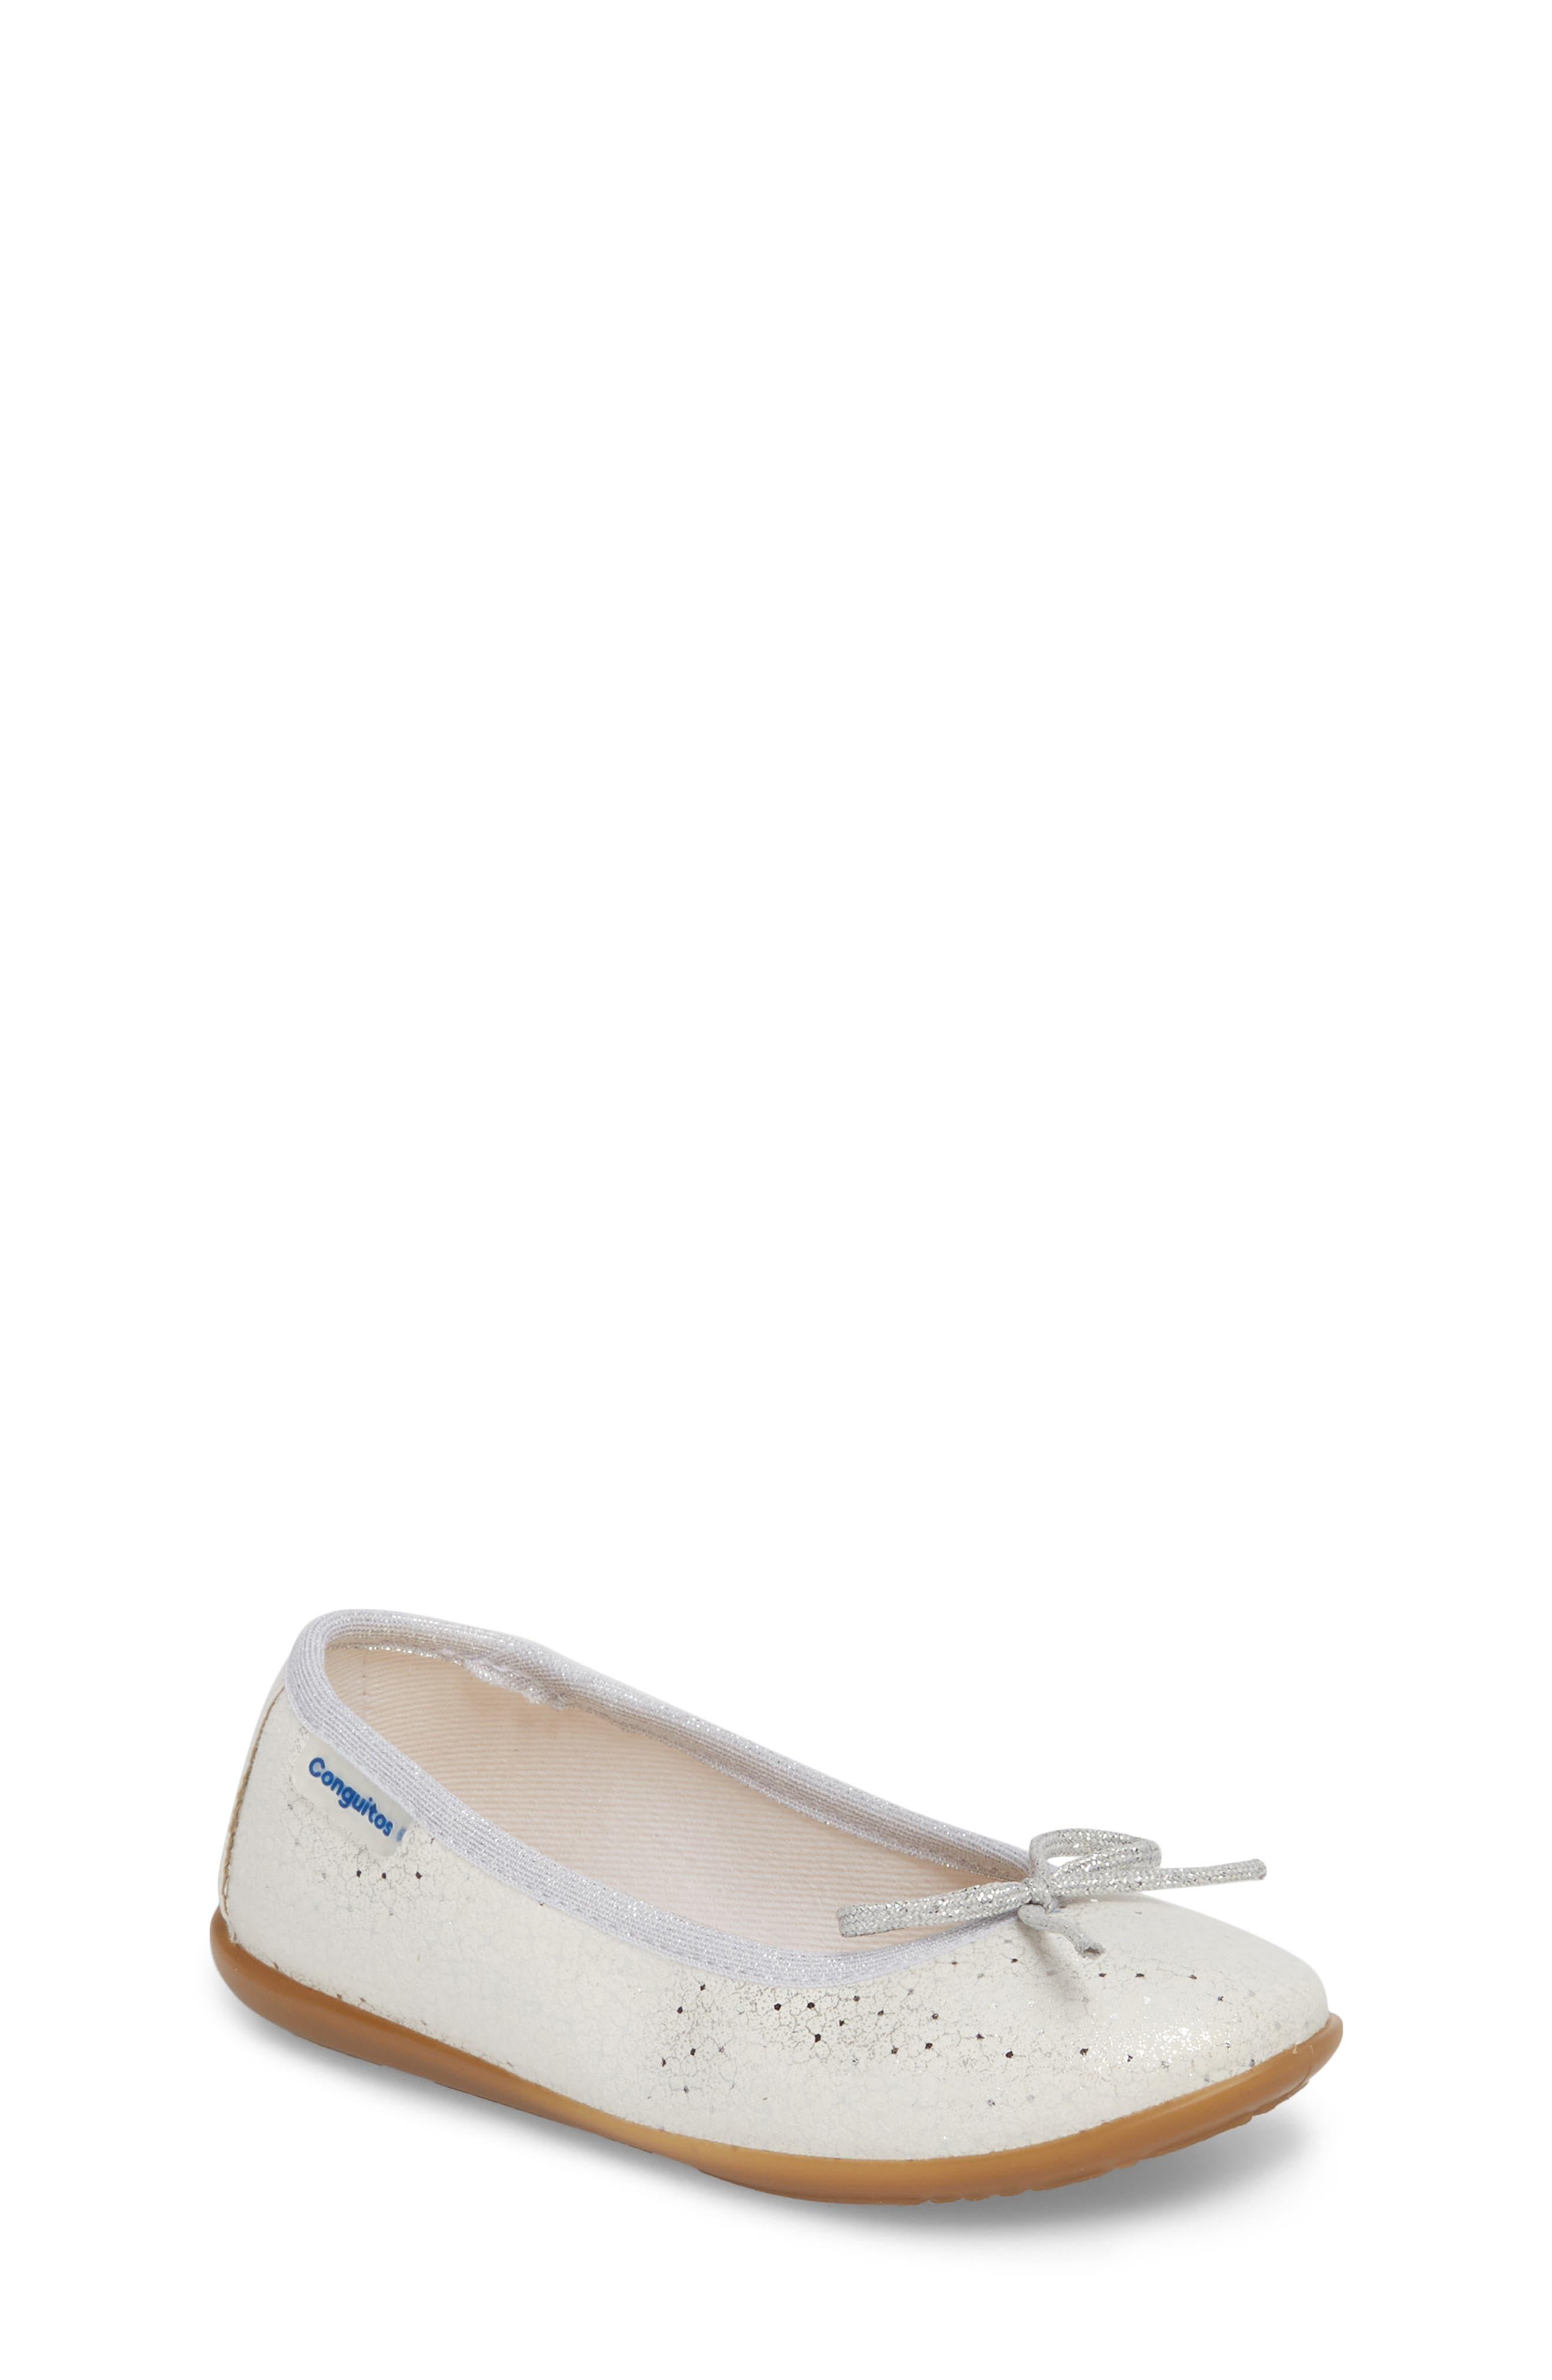 CONGUITOS Aire Metallic Ballet Flat, Main, color, 040